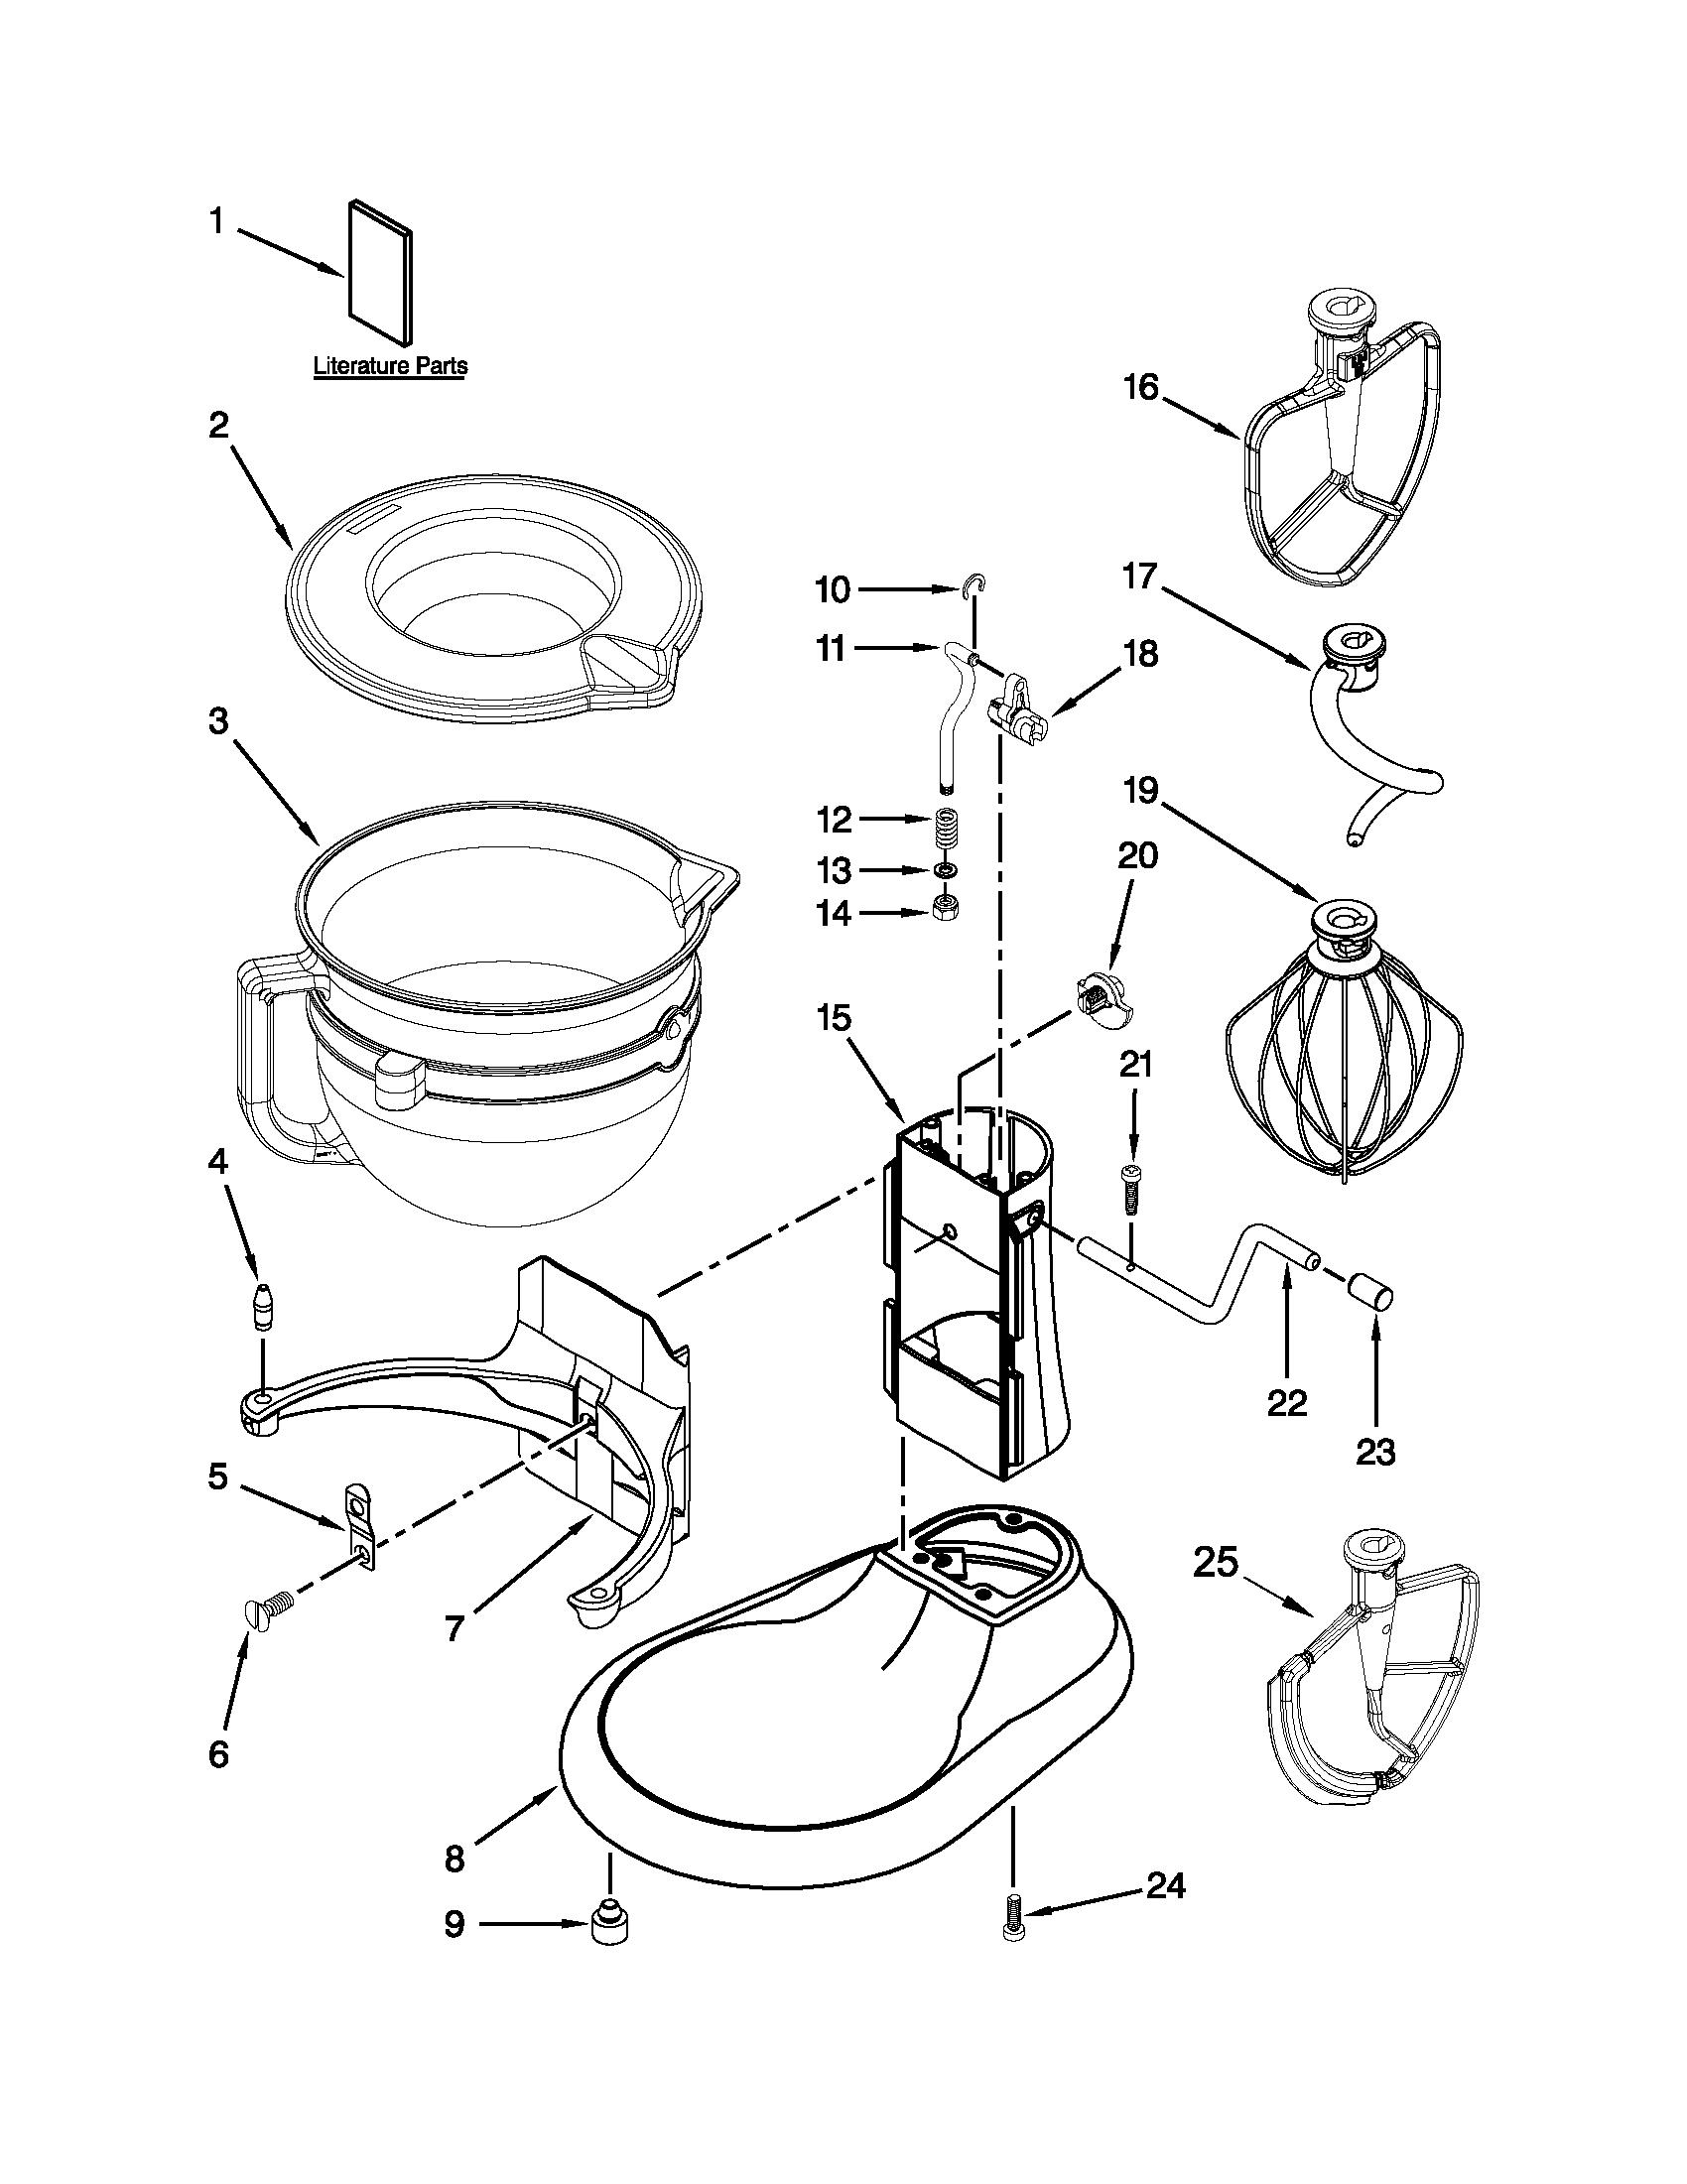 BASE AND PEDESTAL UNIT Diagram & Parts List for Model